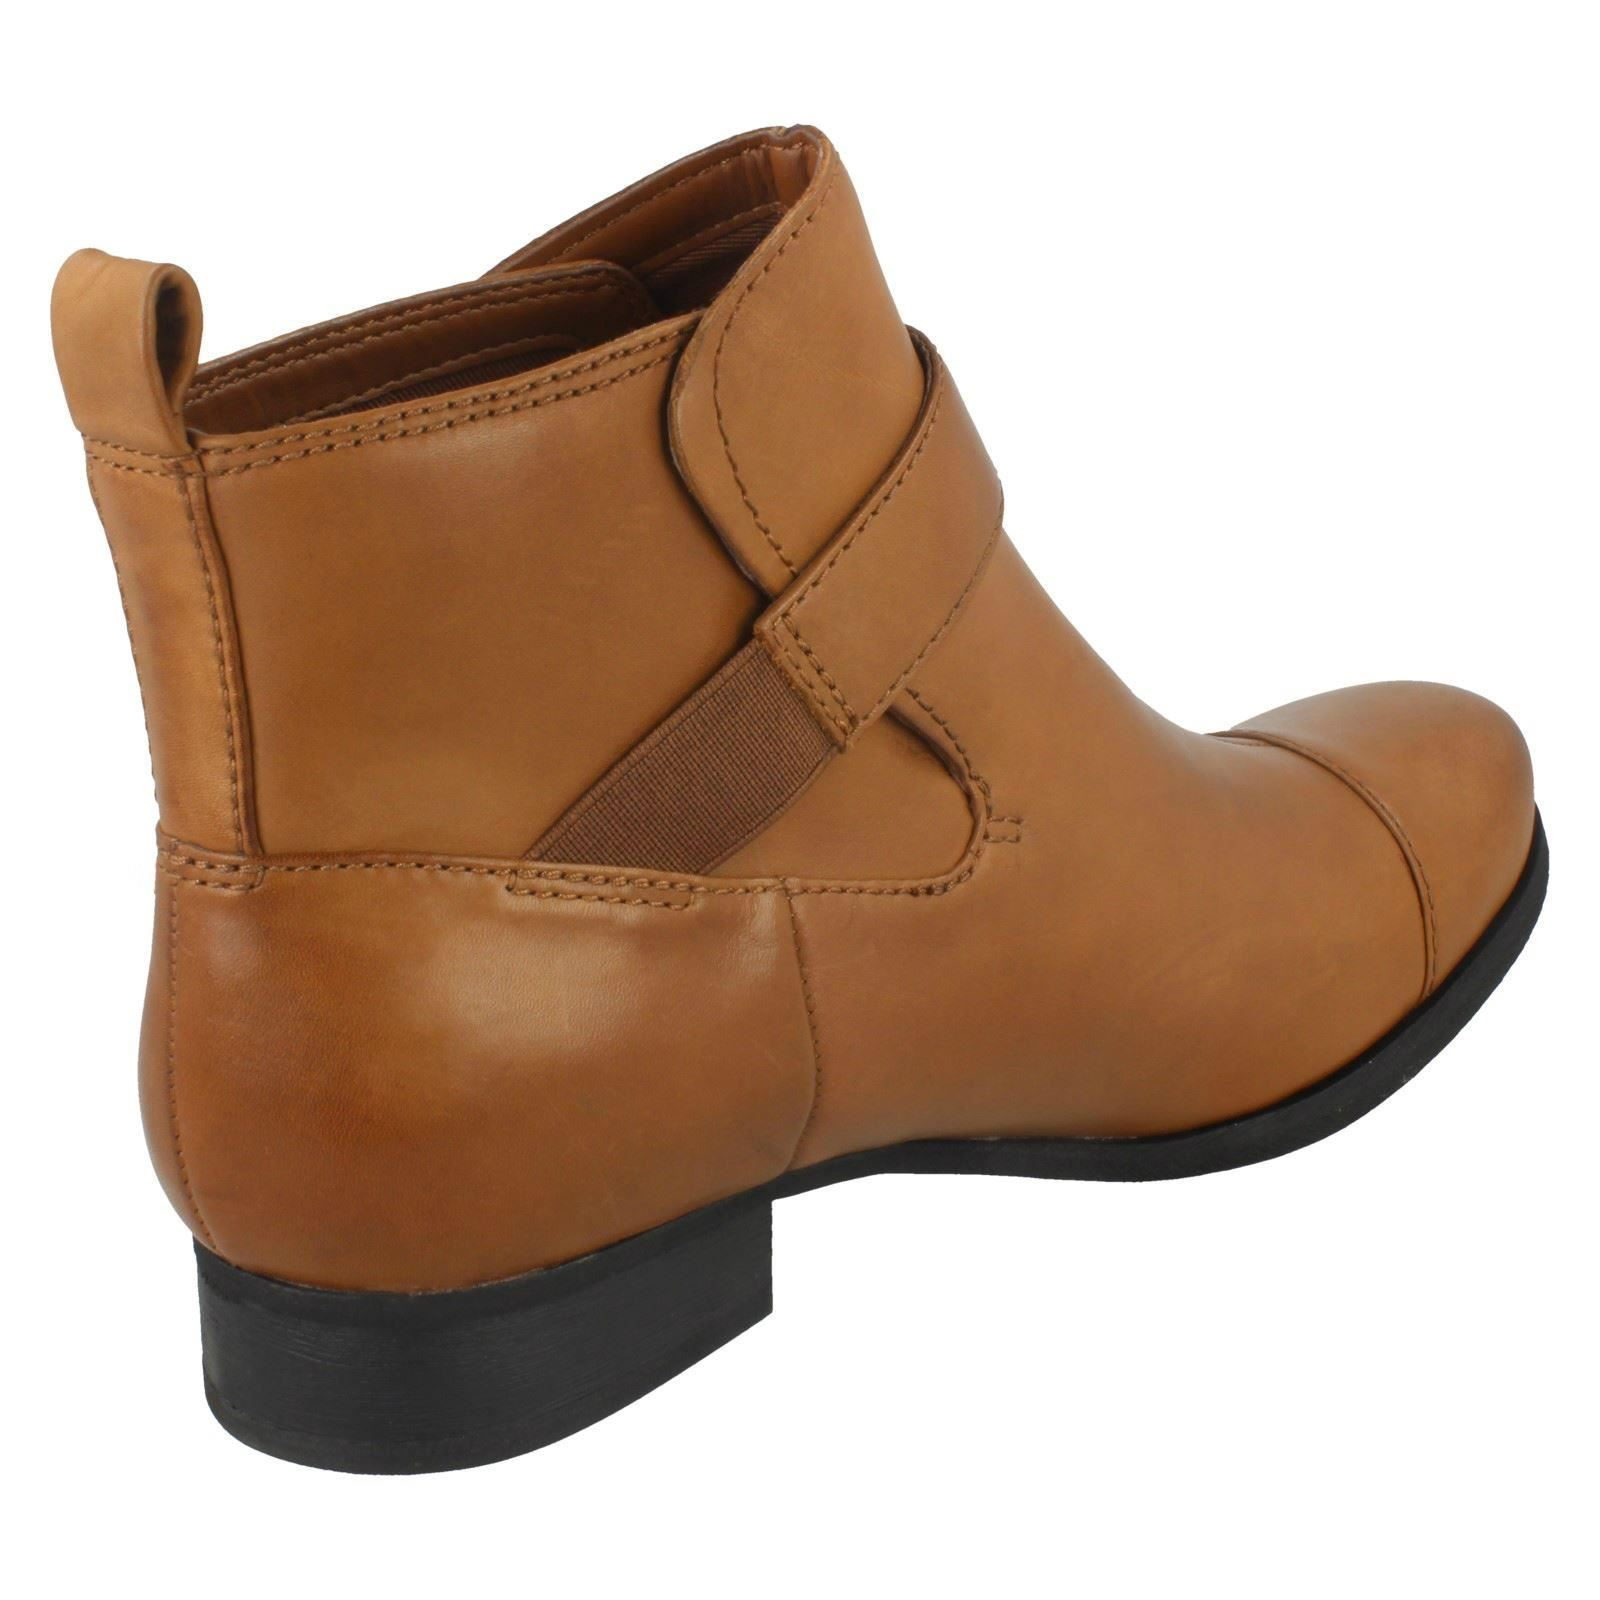 Ladies Clarks Ladbroke Magic Ankle Boots